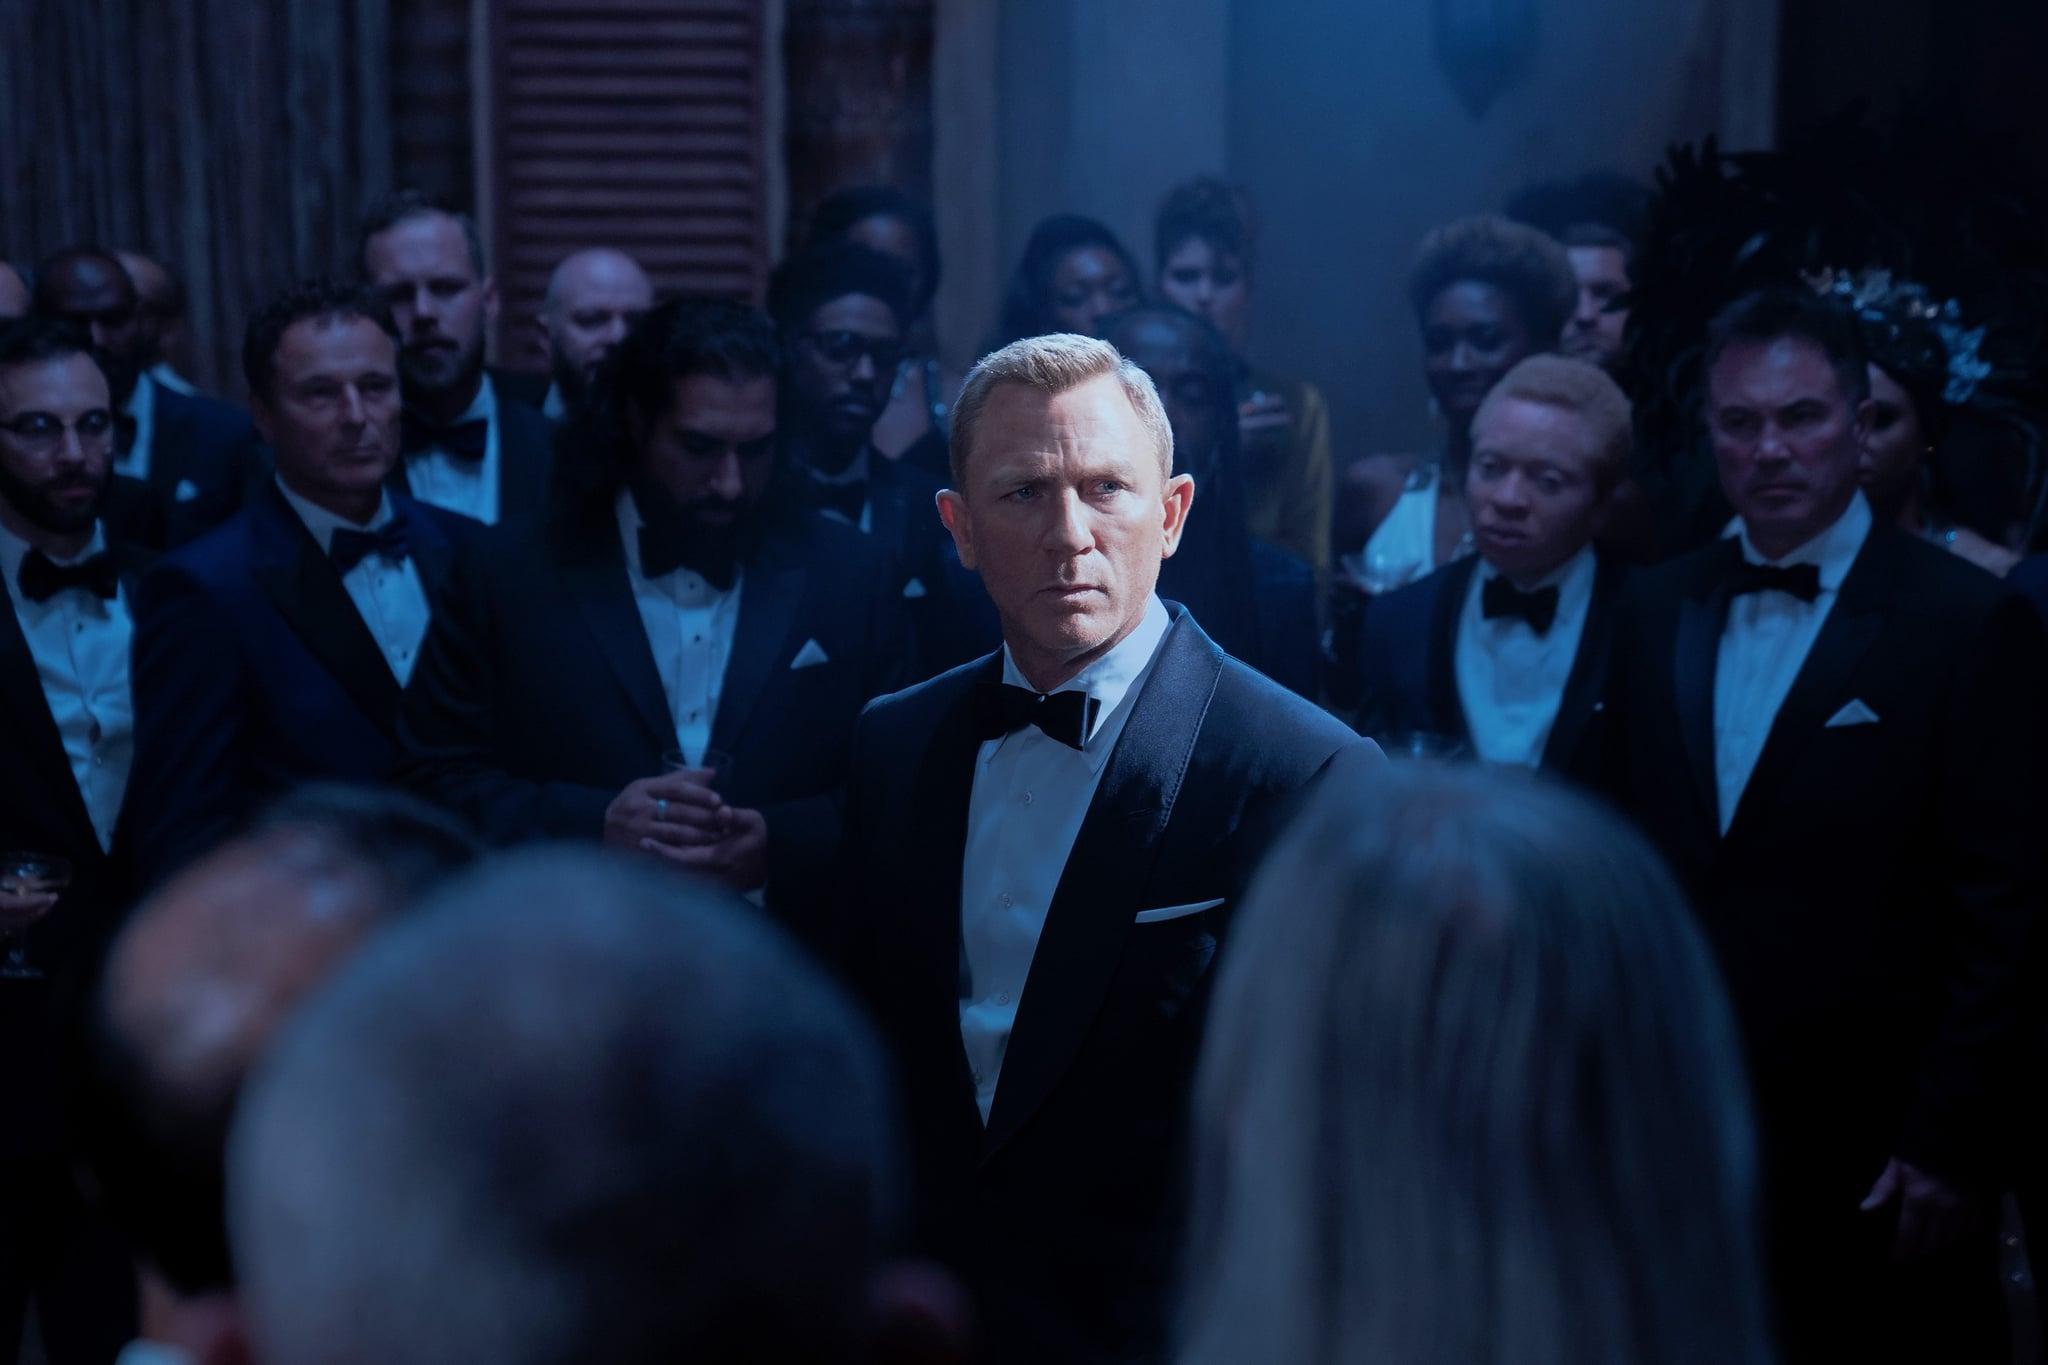 NO TIME TO DIE, Daniel Craig as James Bond, 2021. ph: Nicola Dove /  MGM /  Danjaq / Courtesy Everett Collection